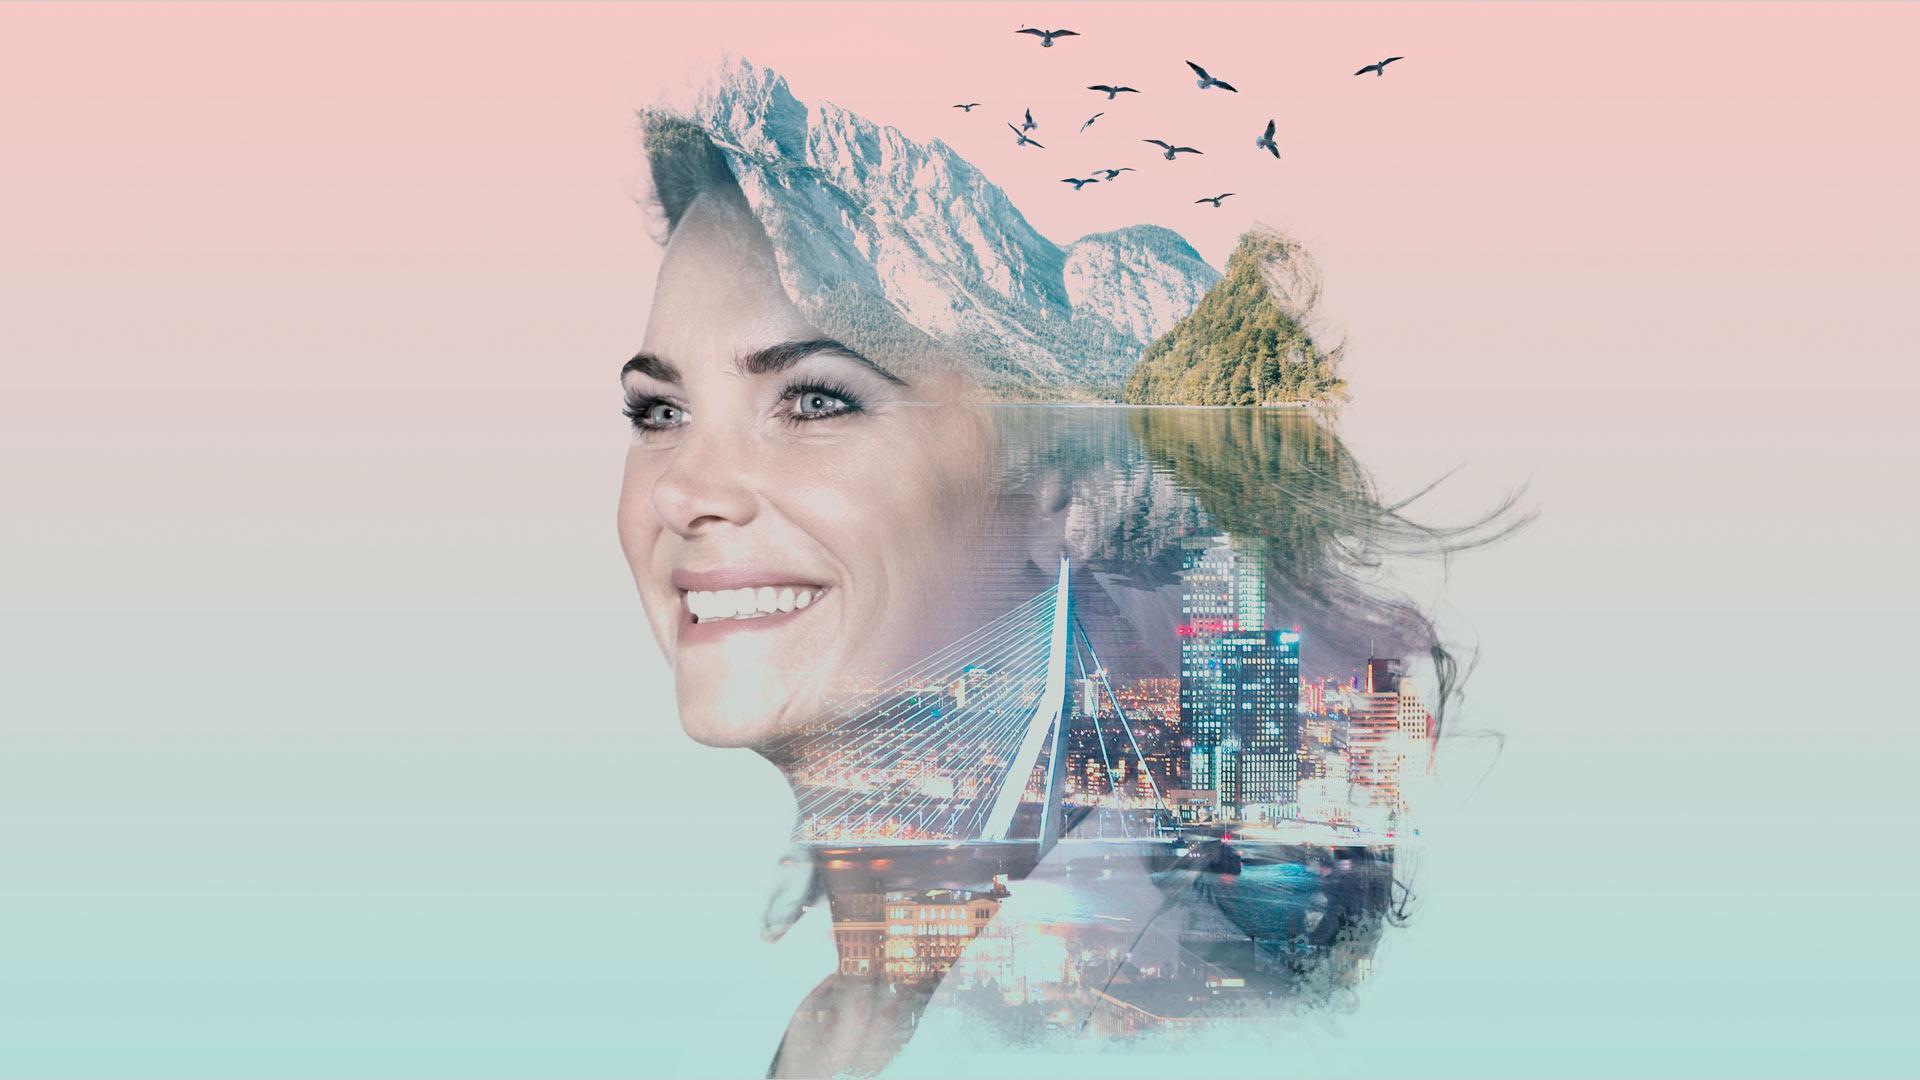 Charlotte Labee Brain Balance live in Ahoy